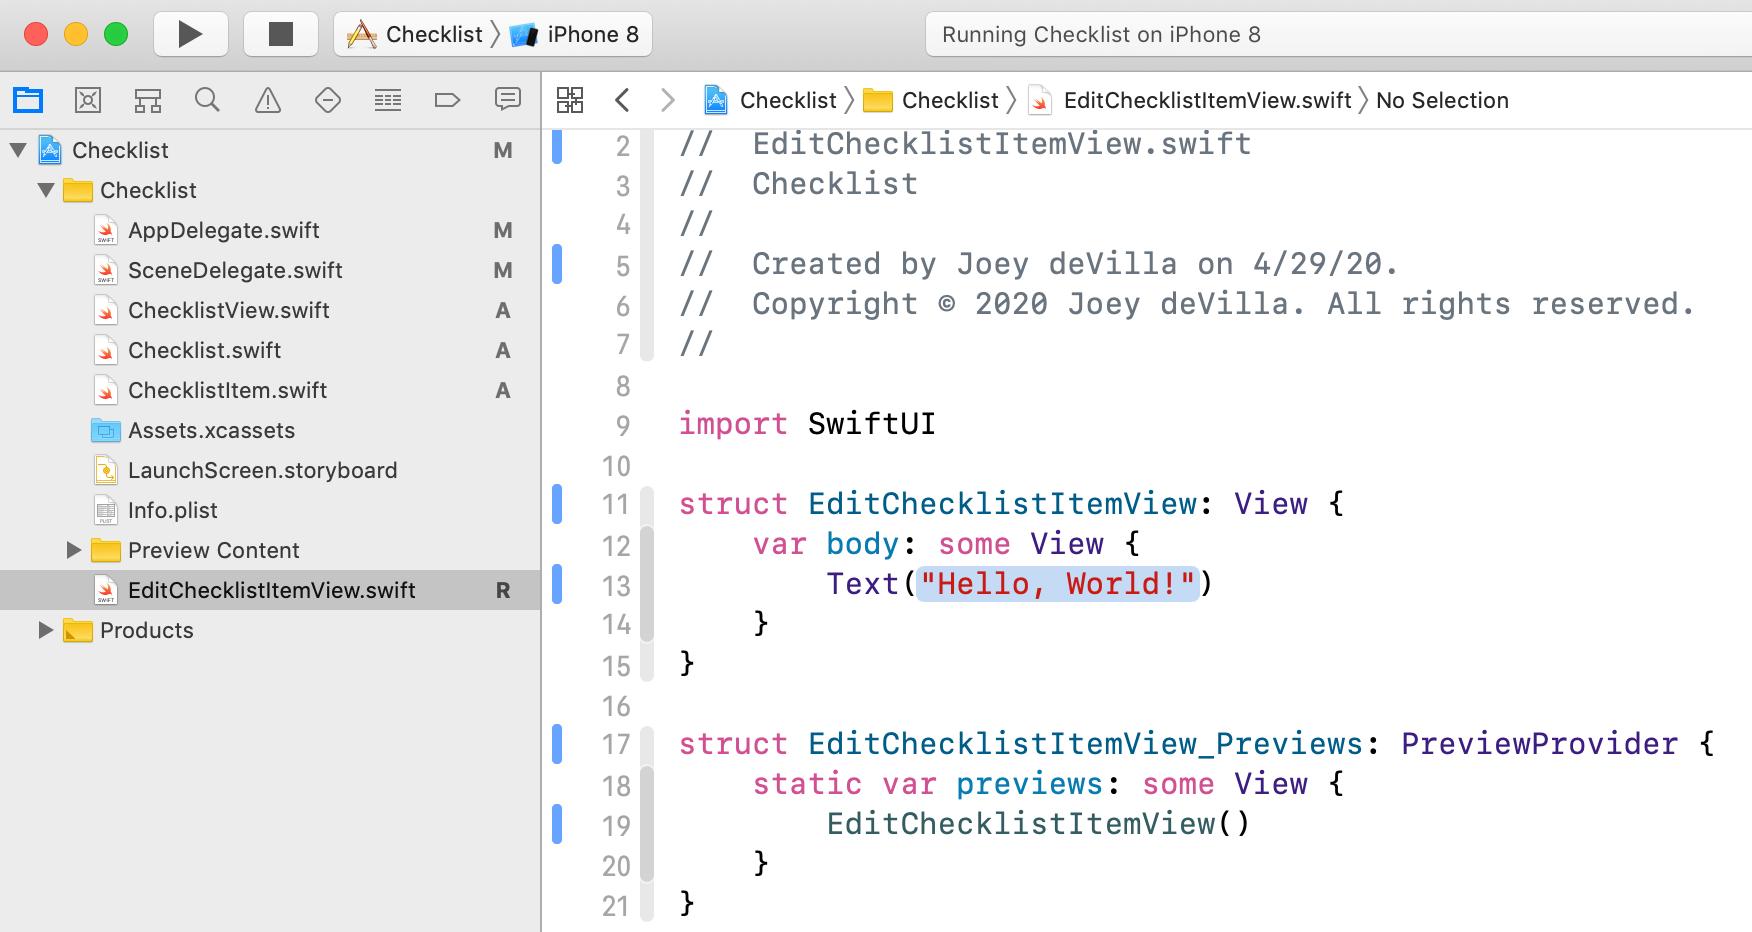 The new EditChecklistItemView.swift file